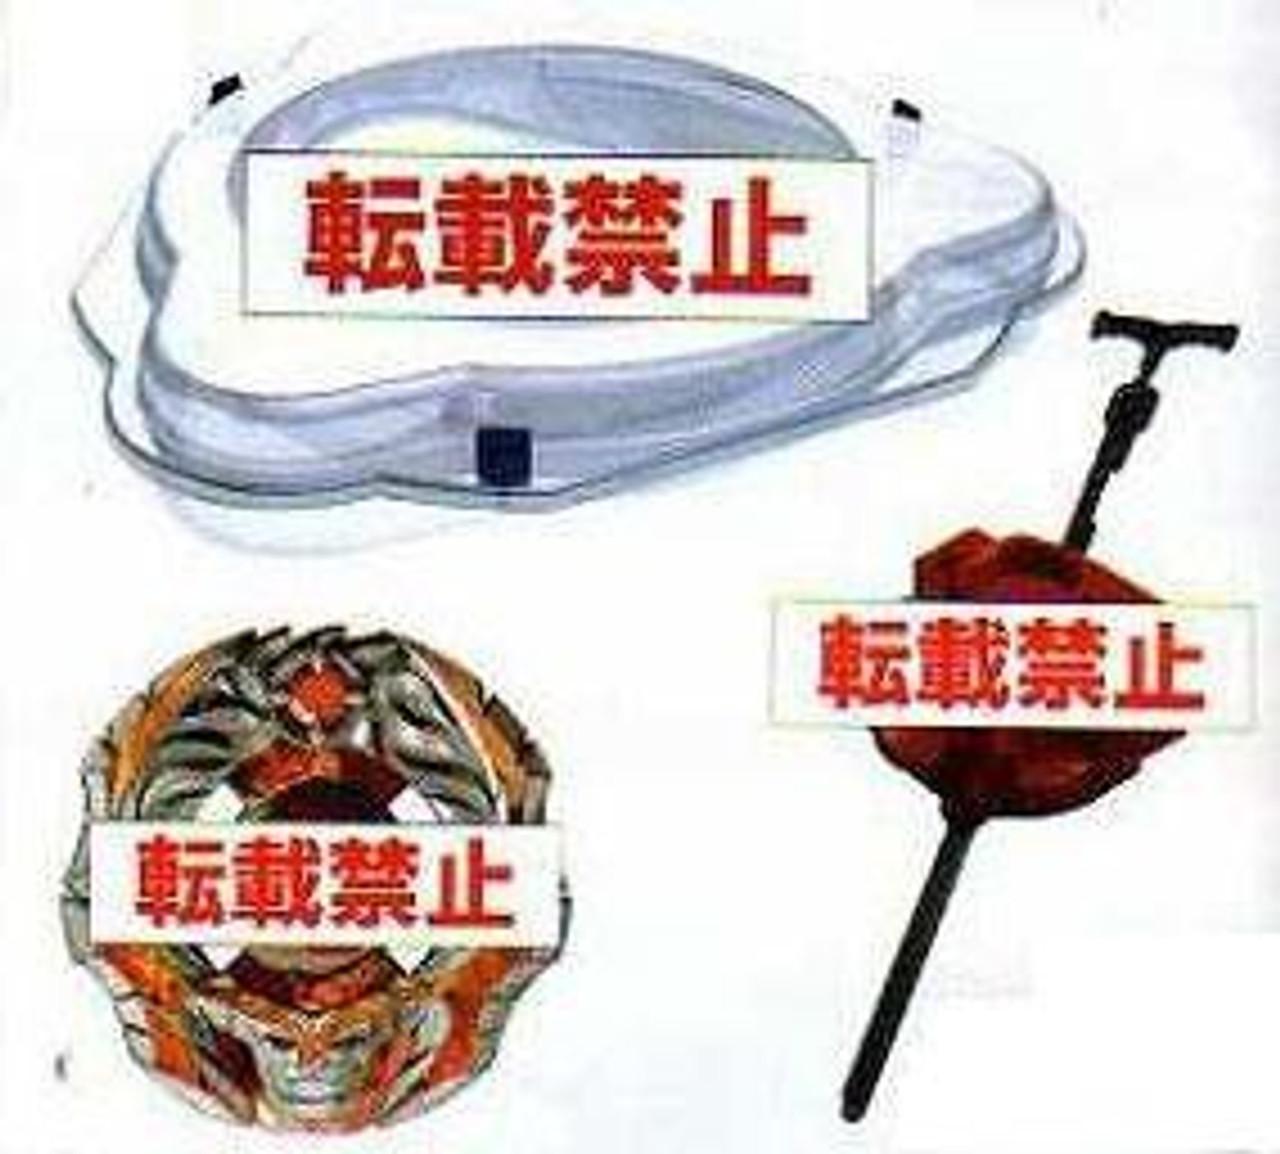 Beyblade Zero G Japanese Start Dash Set Starter Set BB-03